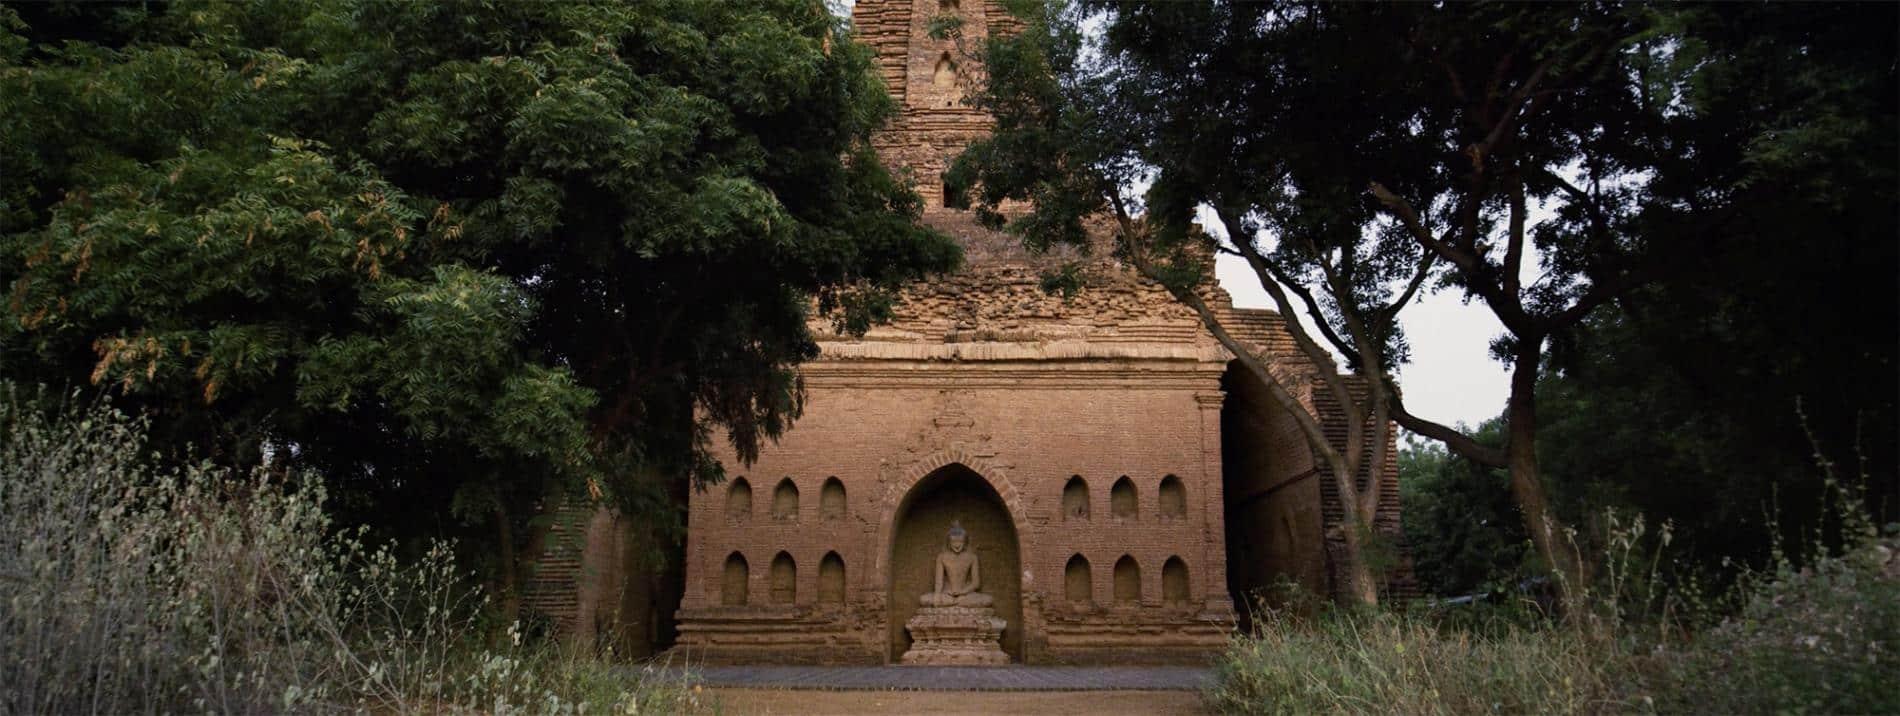 friedman guaardians of paradise pagoda